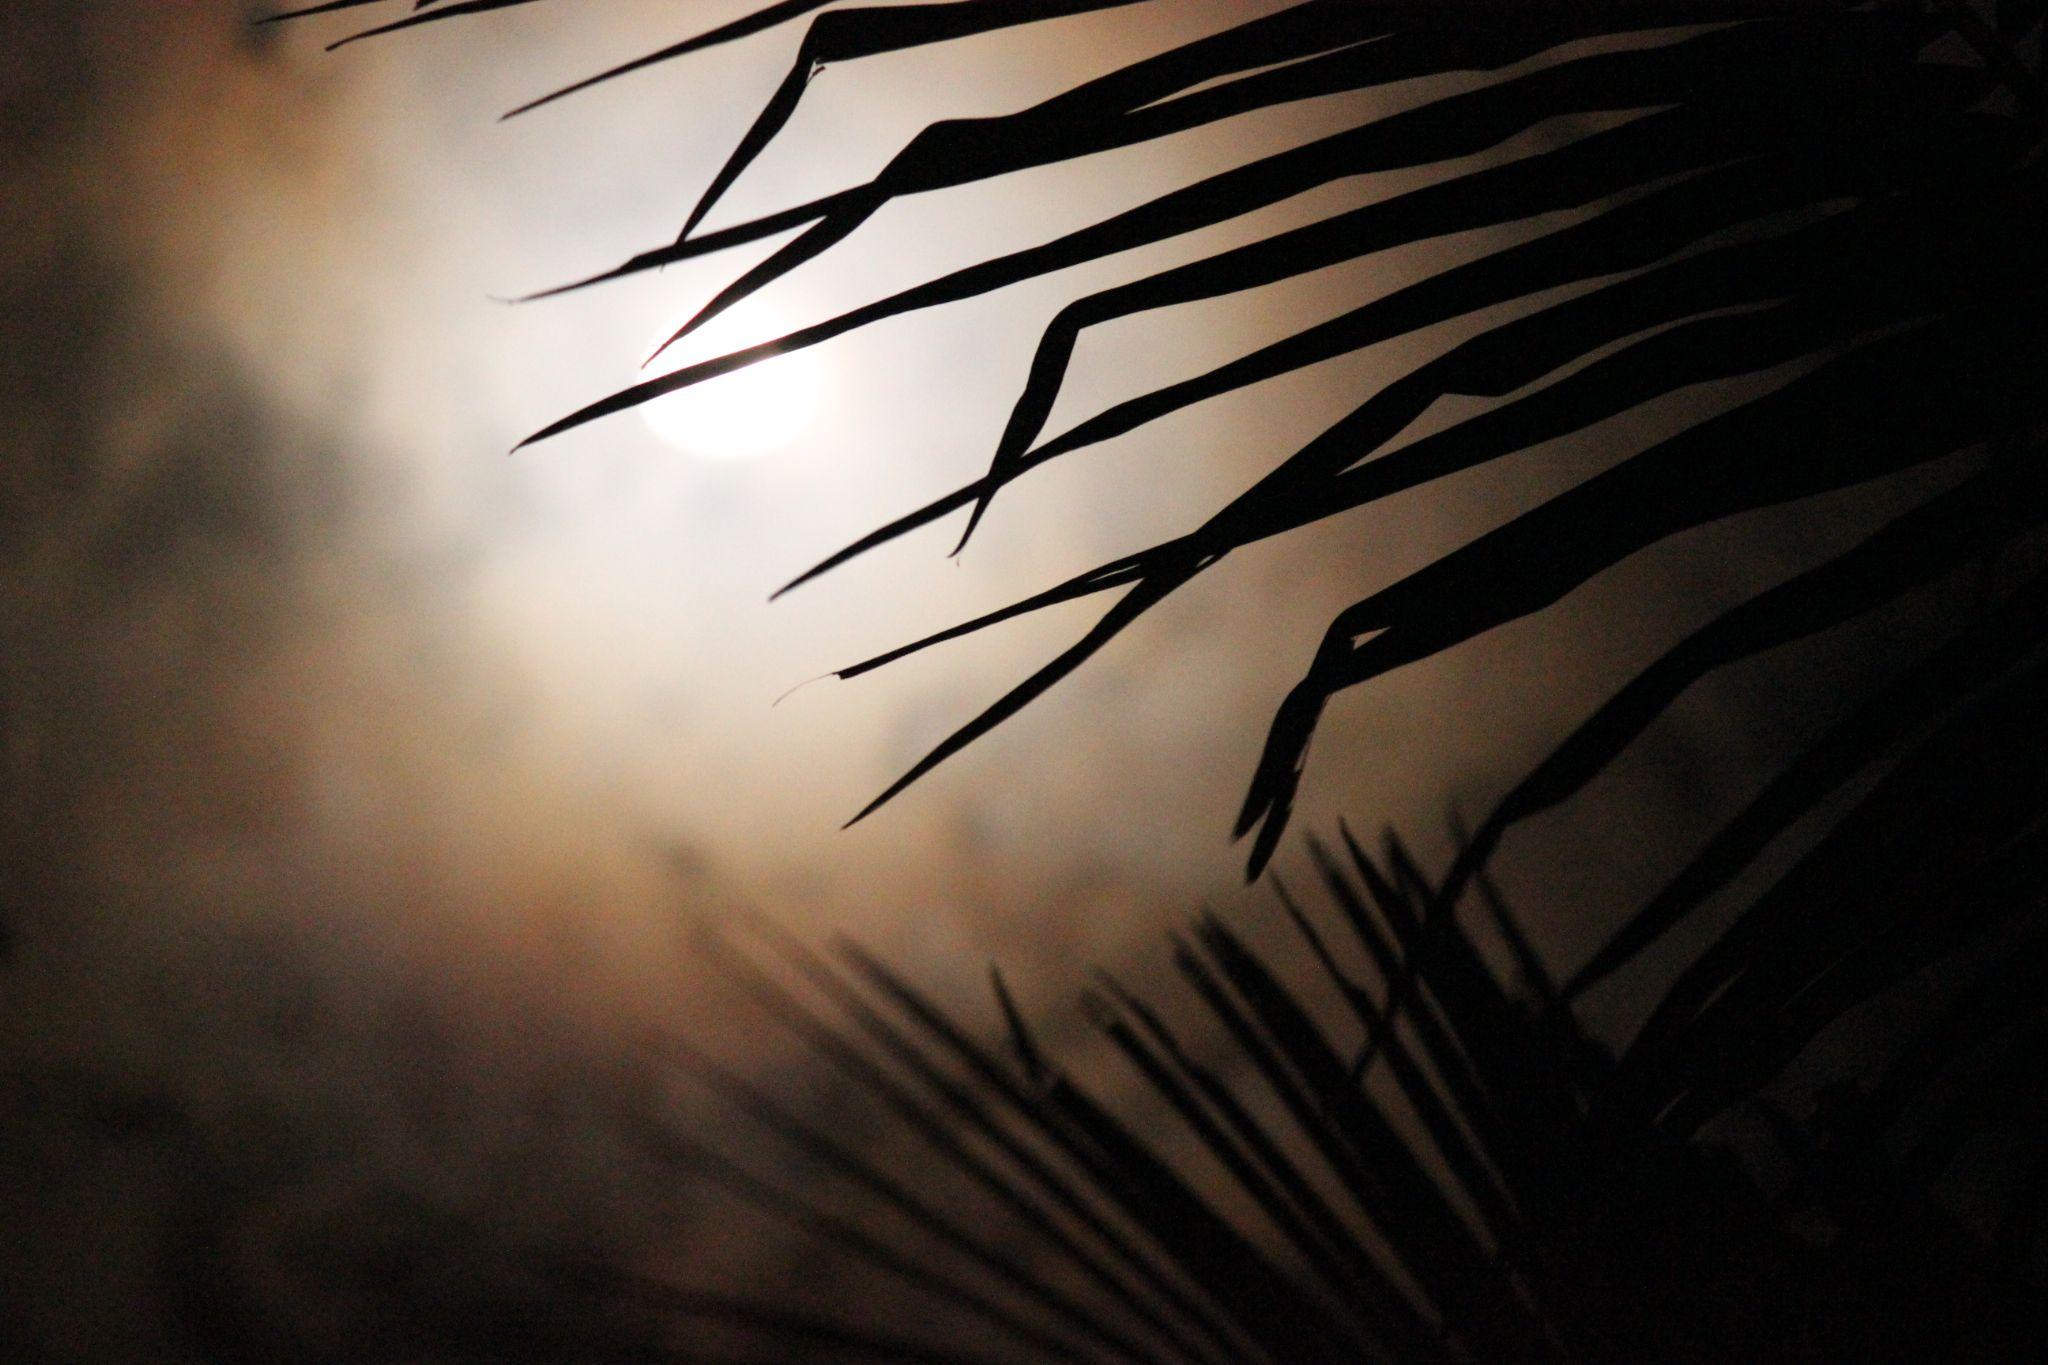 Peek a boo by Dineshnath Baluchamy